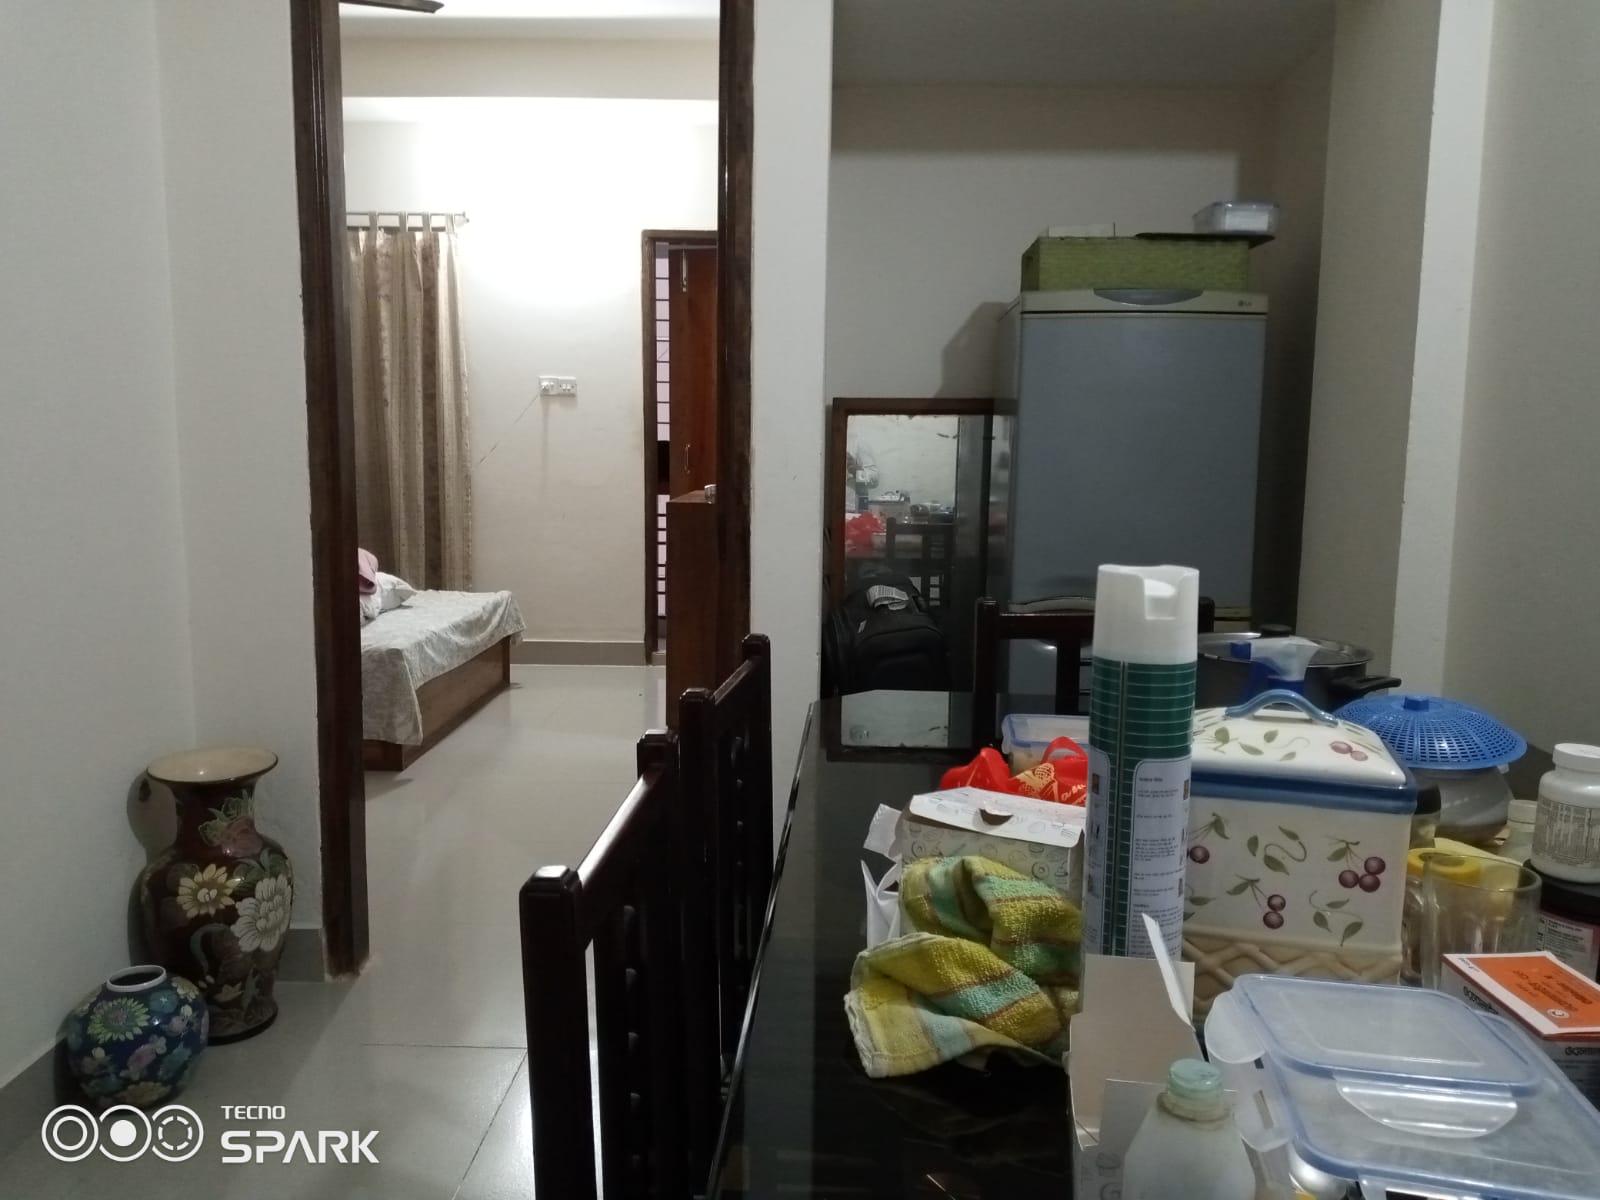 930-sft-apartment-at-nobodoy-housingmohammedpur-5th-floor-075745